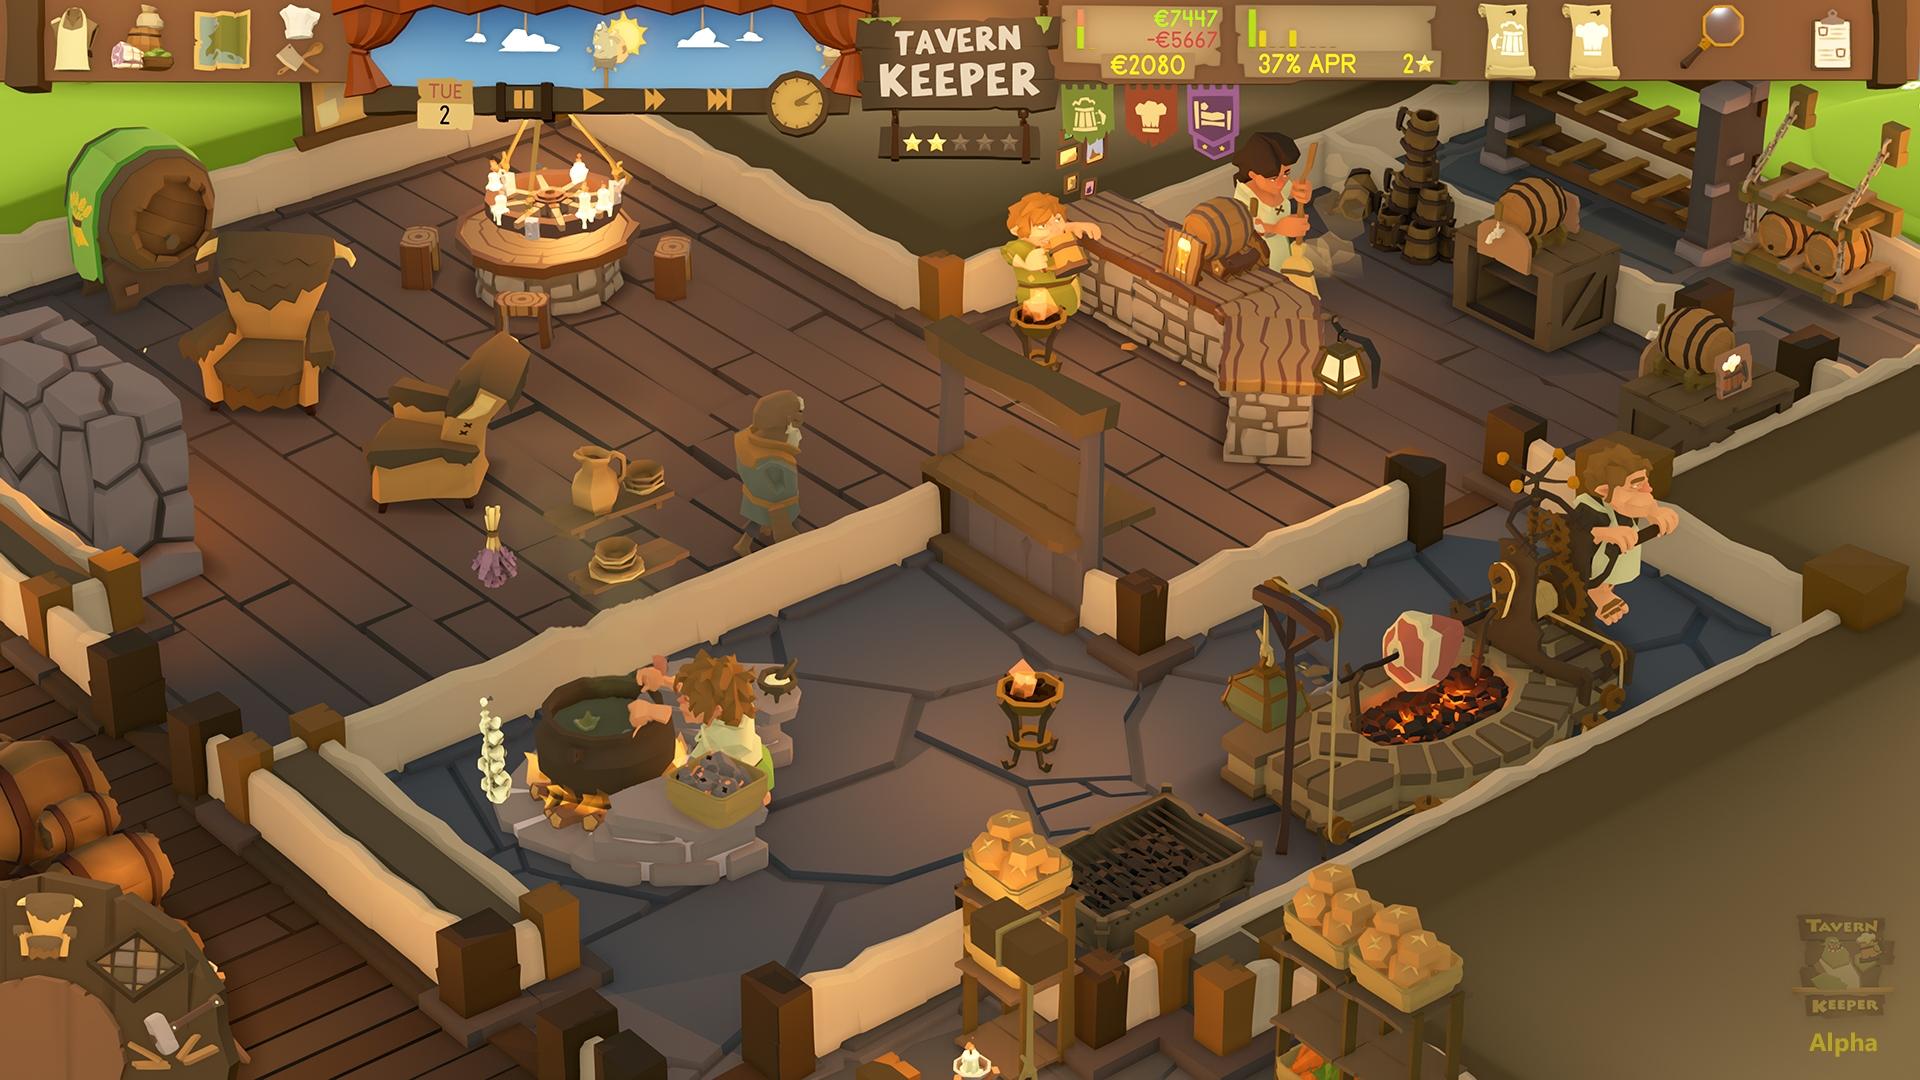 Tavern Keeper Alpha Screenshot 2